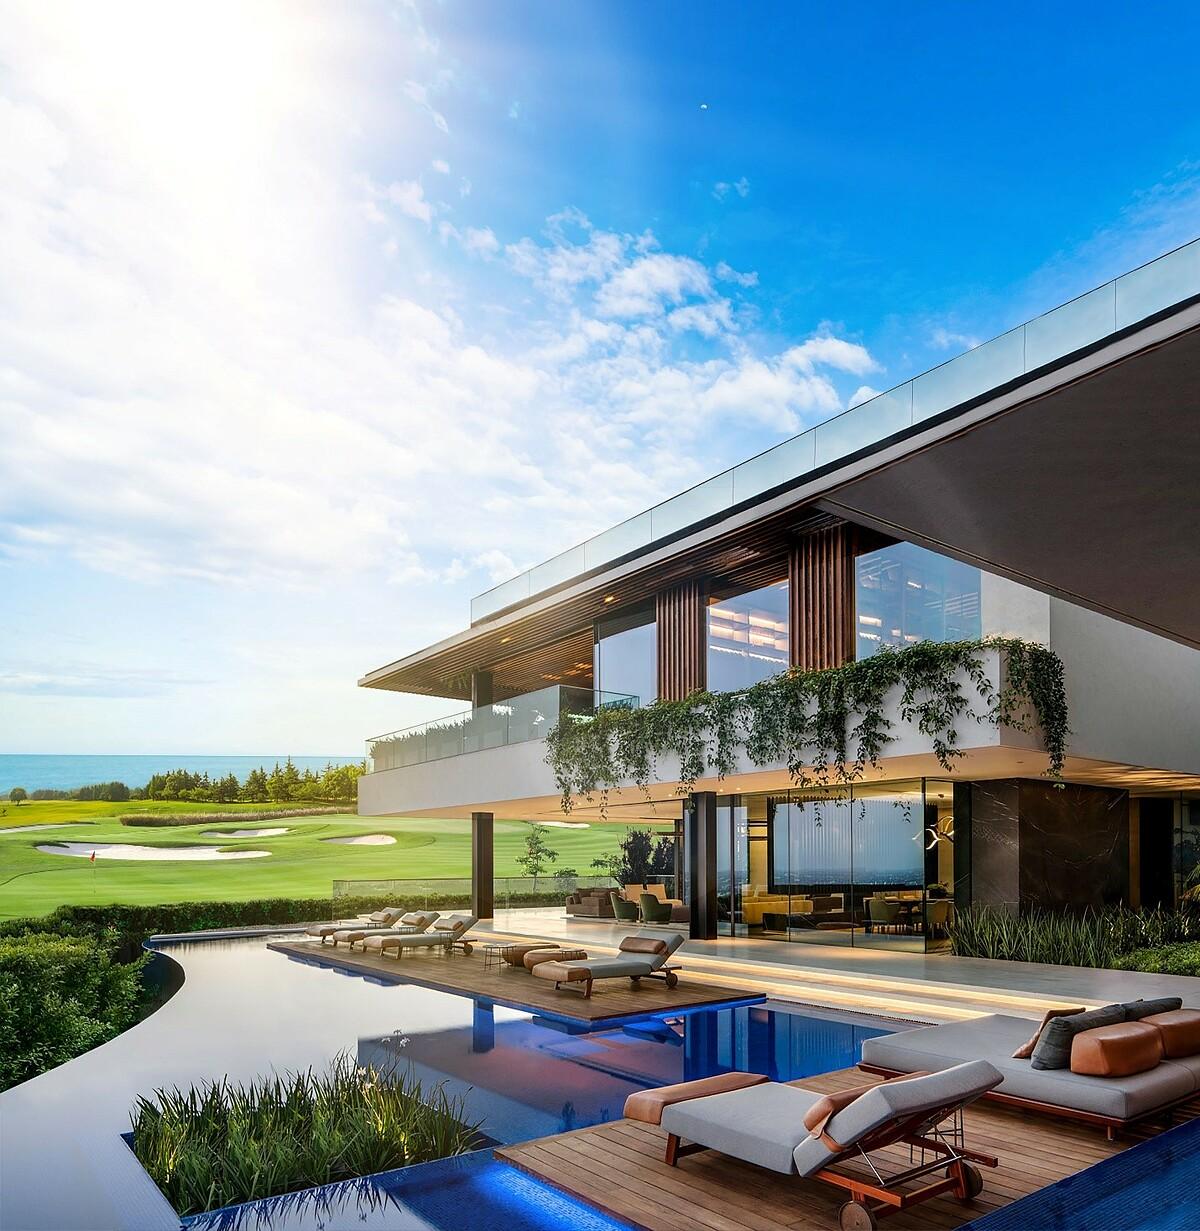 Phối cảnh biệt thự PGA Golf Villas tại NovaWorld Phan Thiet. Ảnh: Novaland.